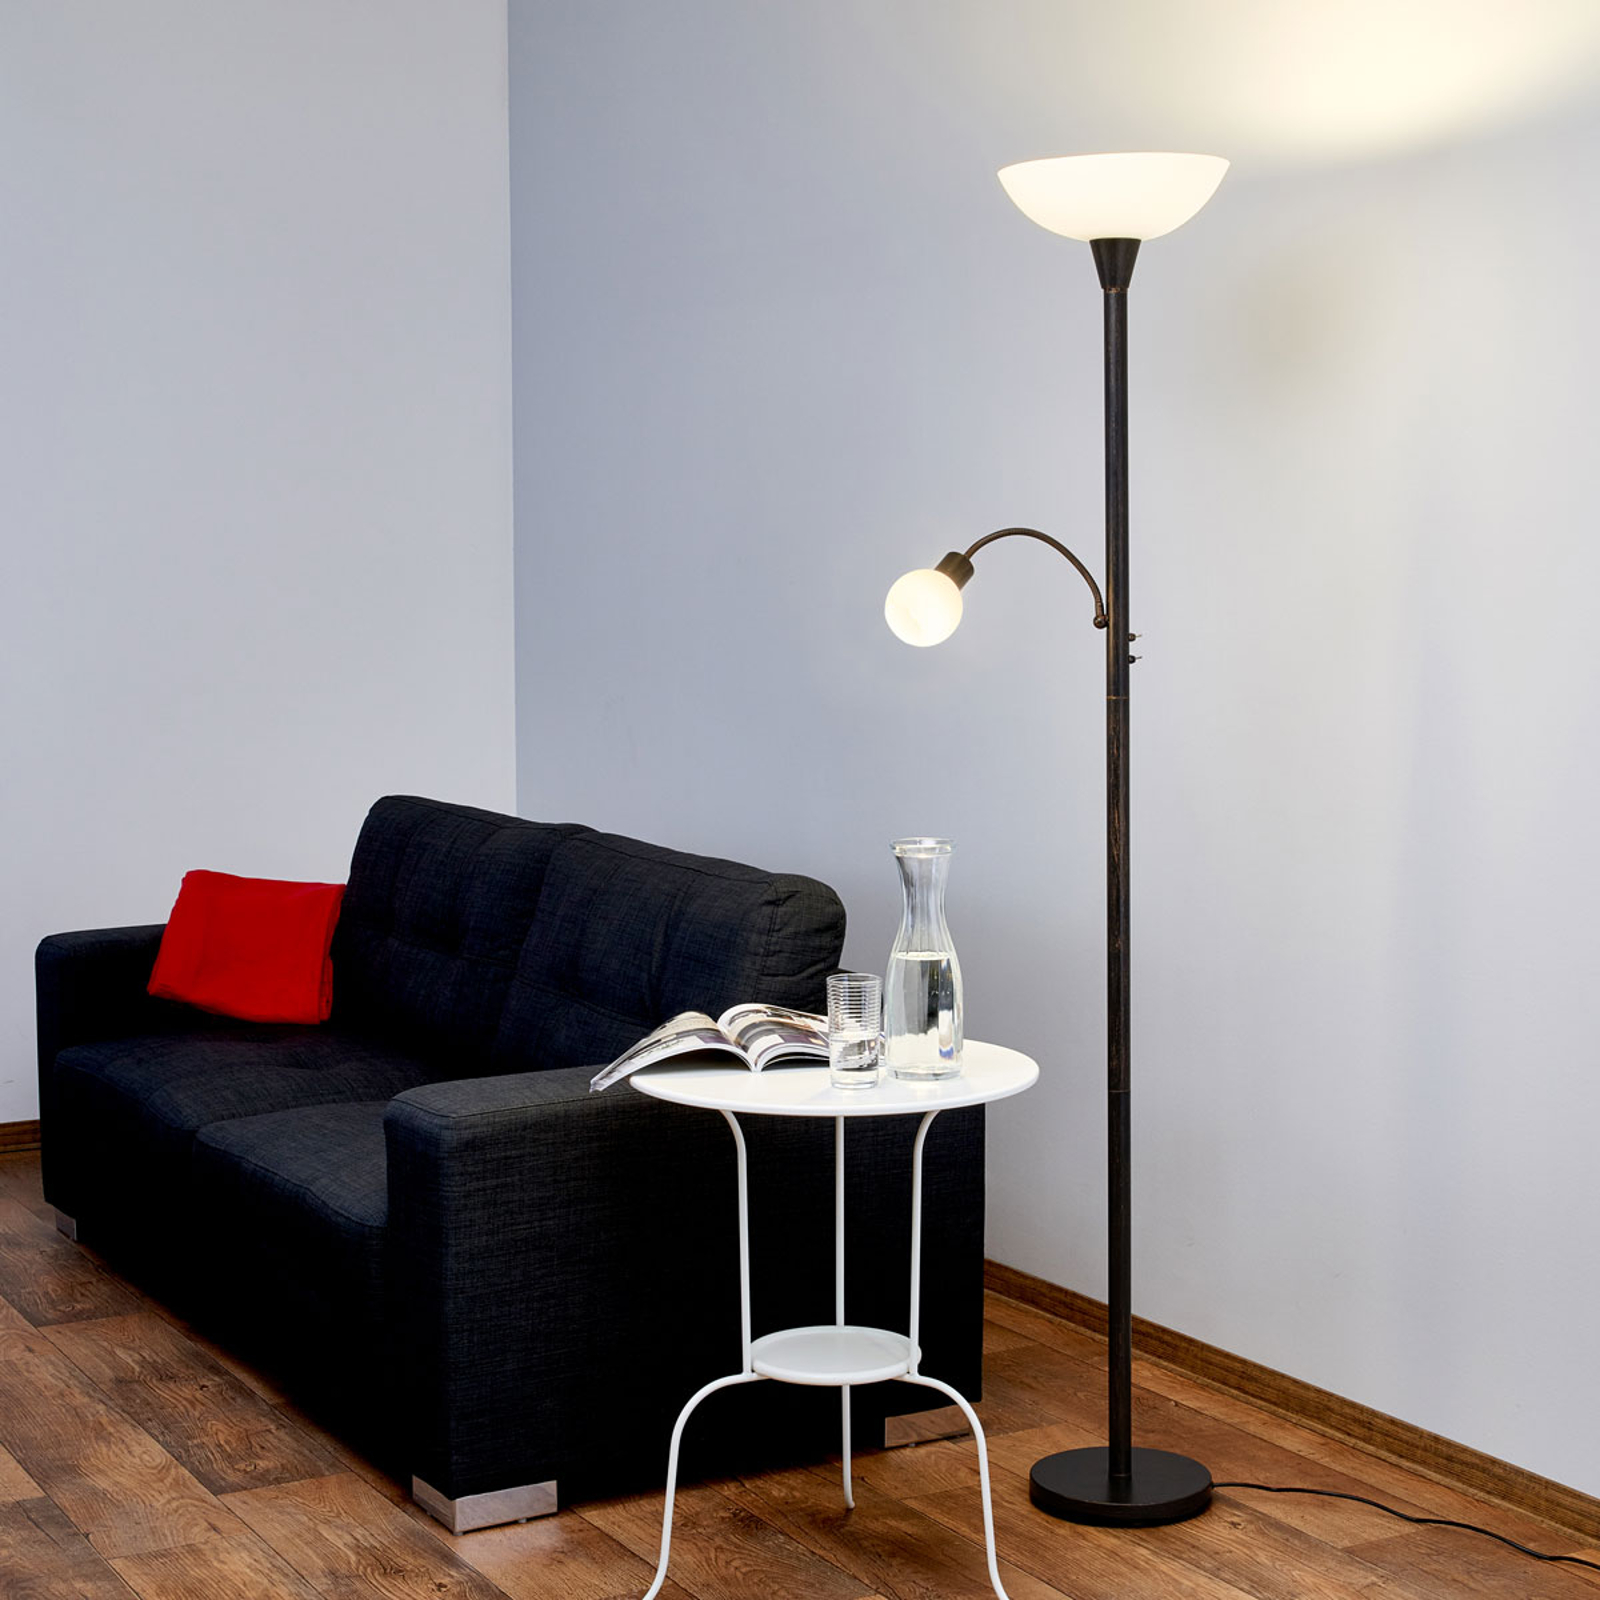 Lampa oświetlająca sufit LED ELAINA w kolorze rdzy